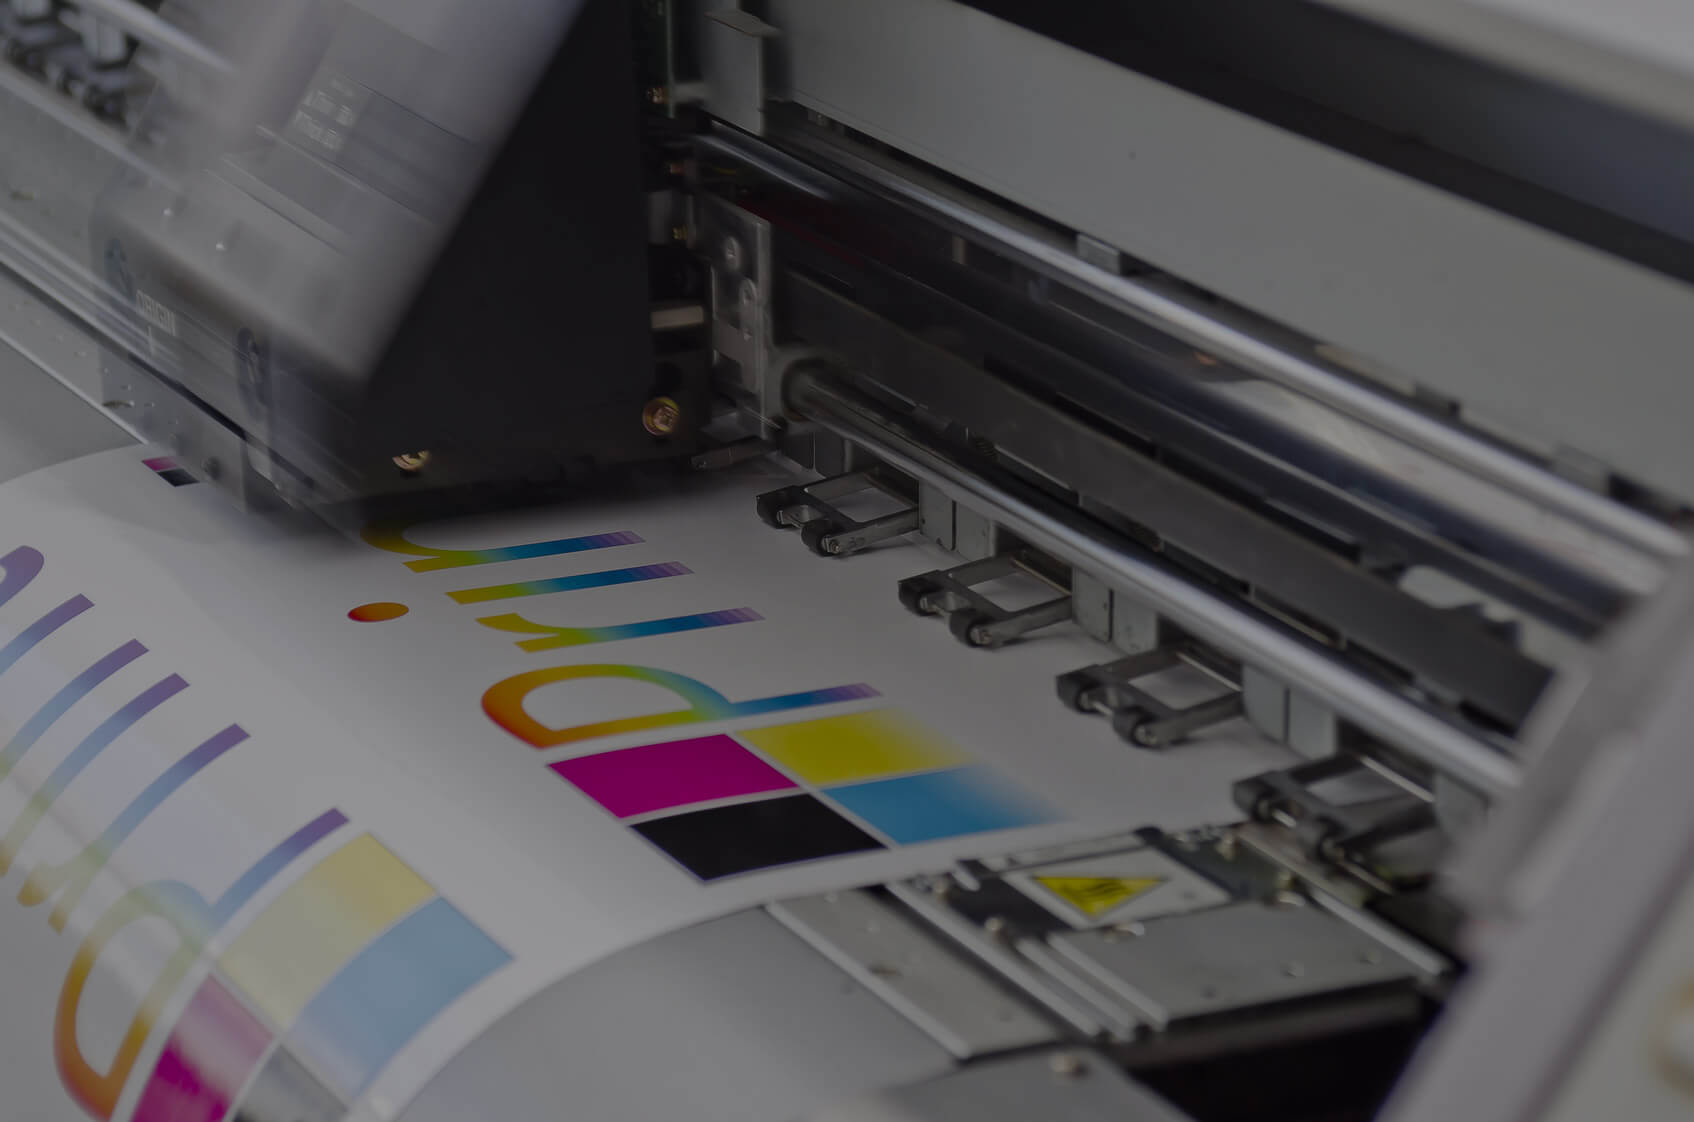 Jurk-Werbetechnik-Digitaldruck